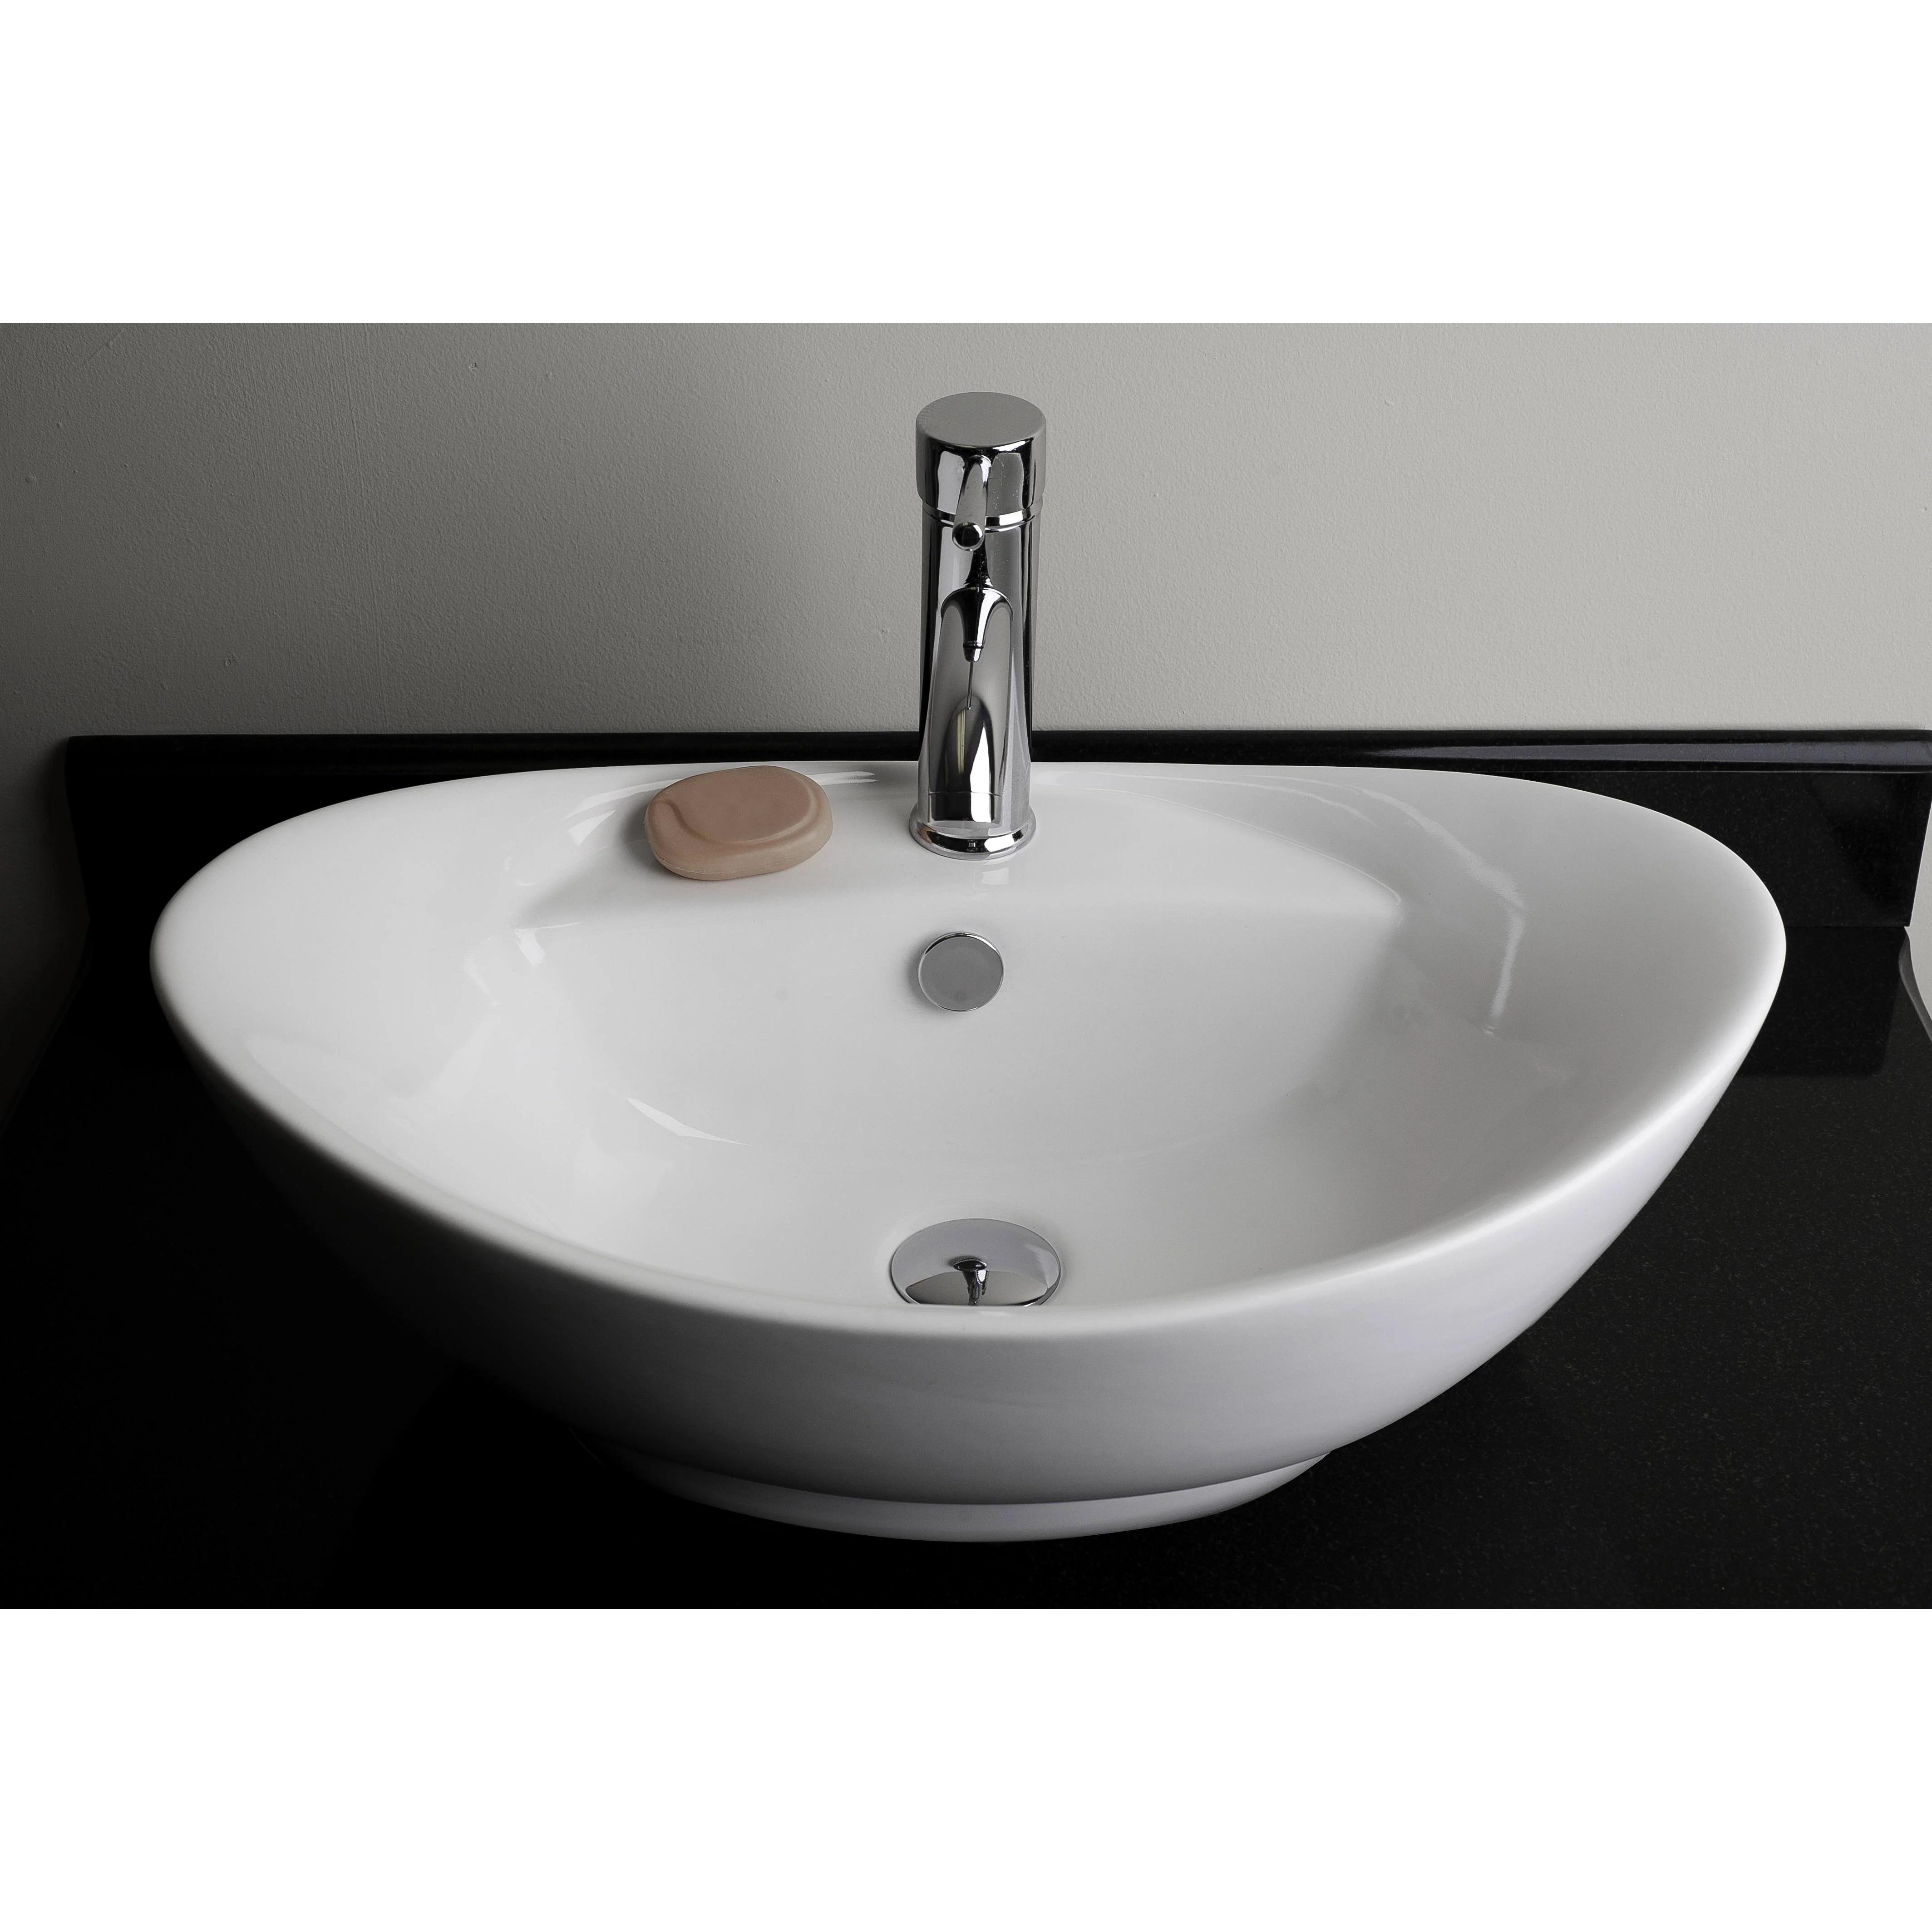 American Imaginations Above Counter Oval Vessel Bathroom